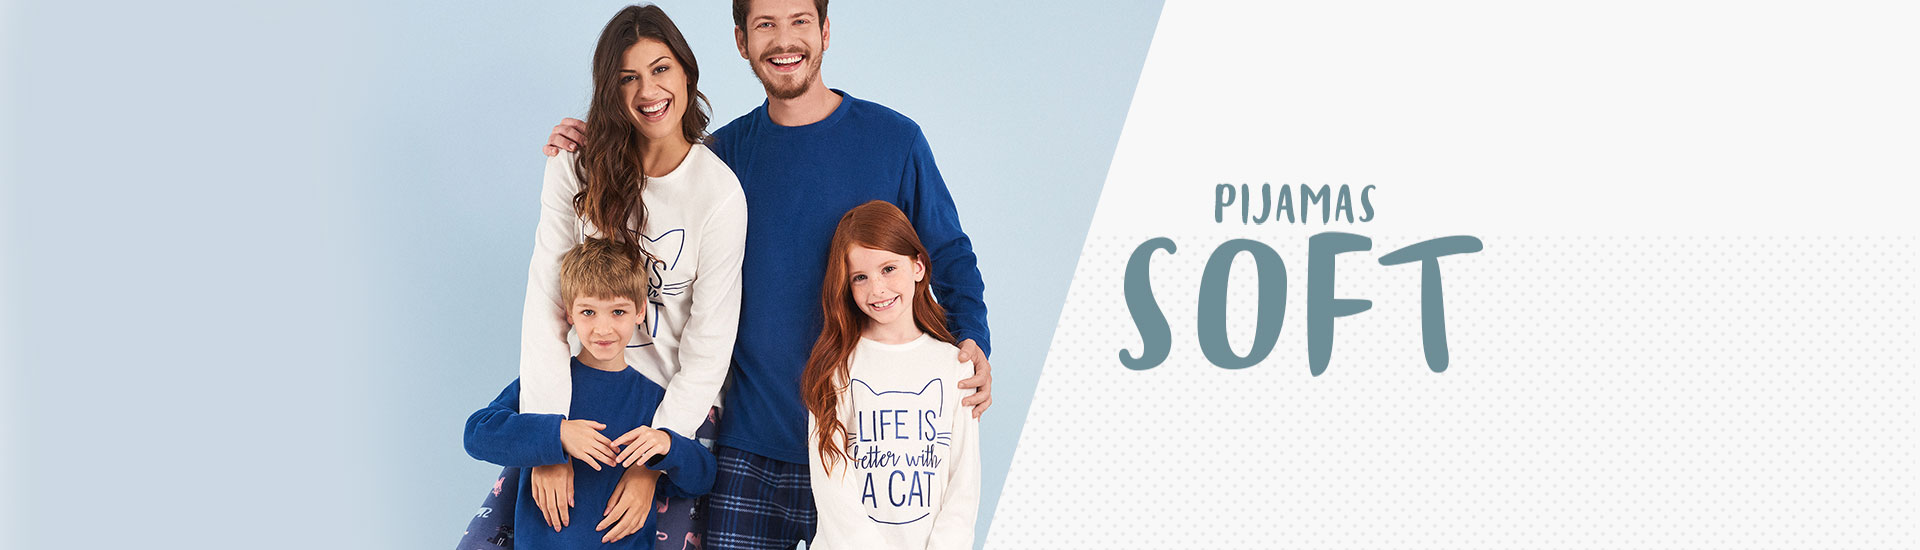 Banner Principal Soft